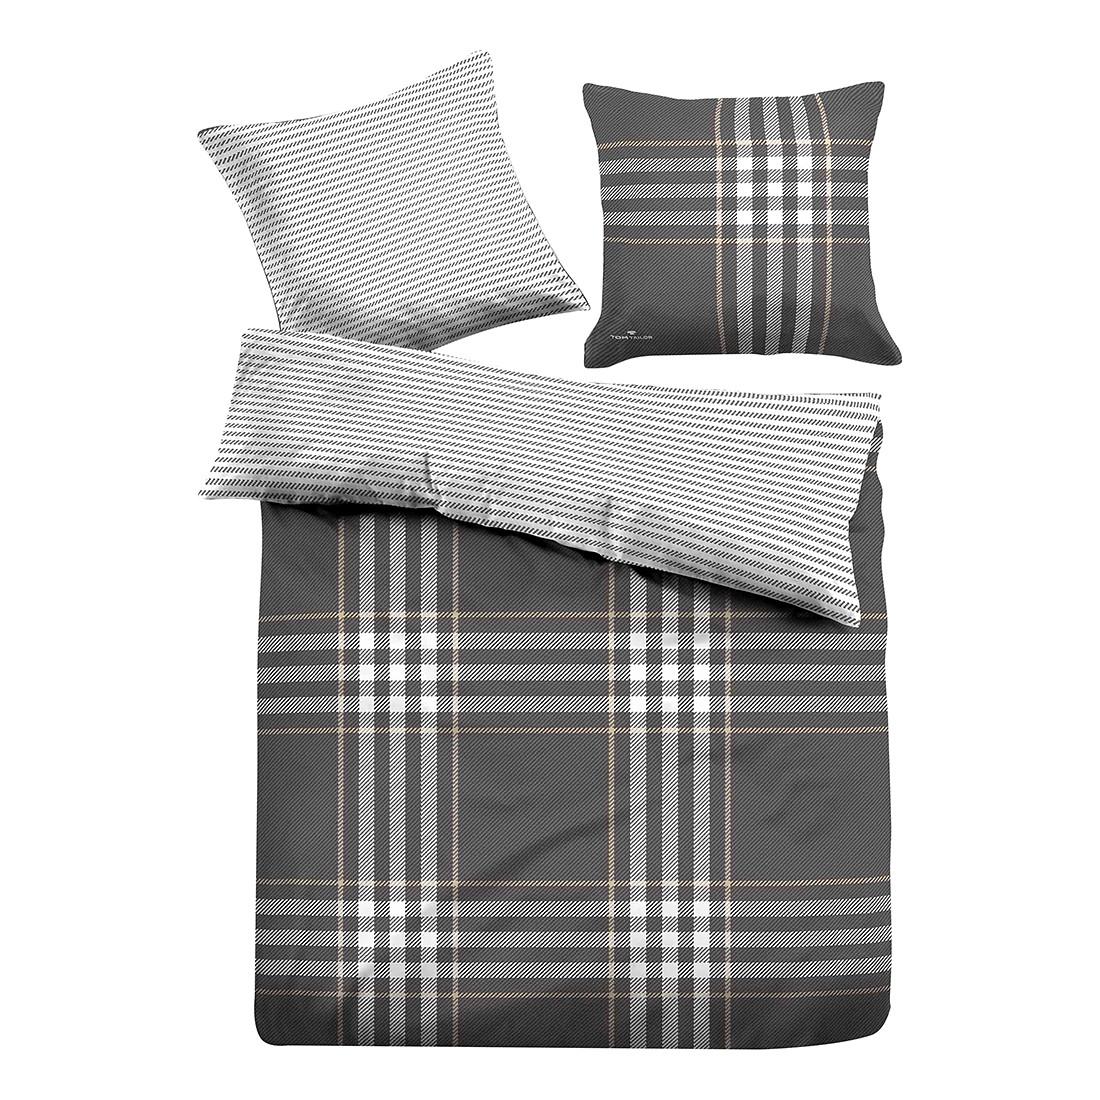 Satin Bettwäsche Home Classics II - Grau / Weiß - 135 x 200 cm + Kissen 80 x 80 cm, Tom Tailor